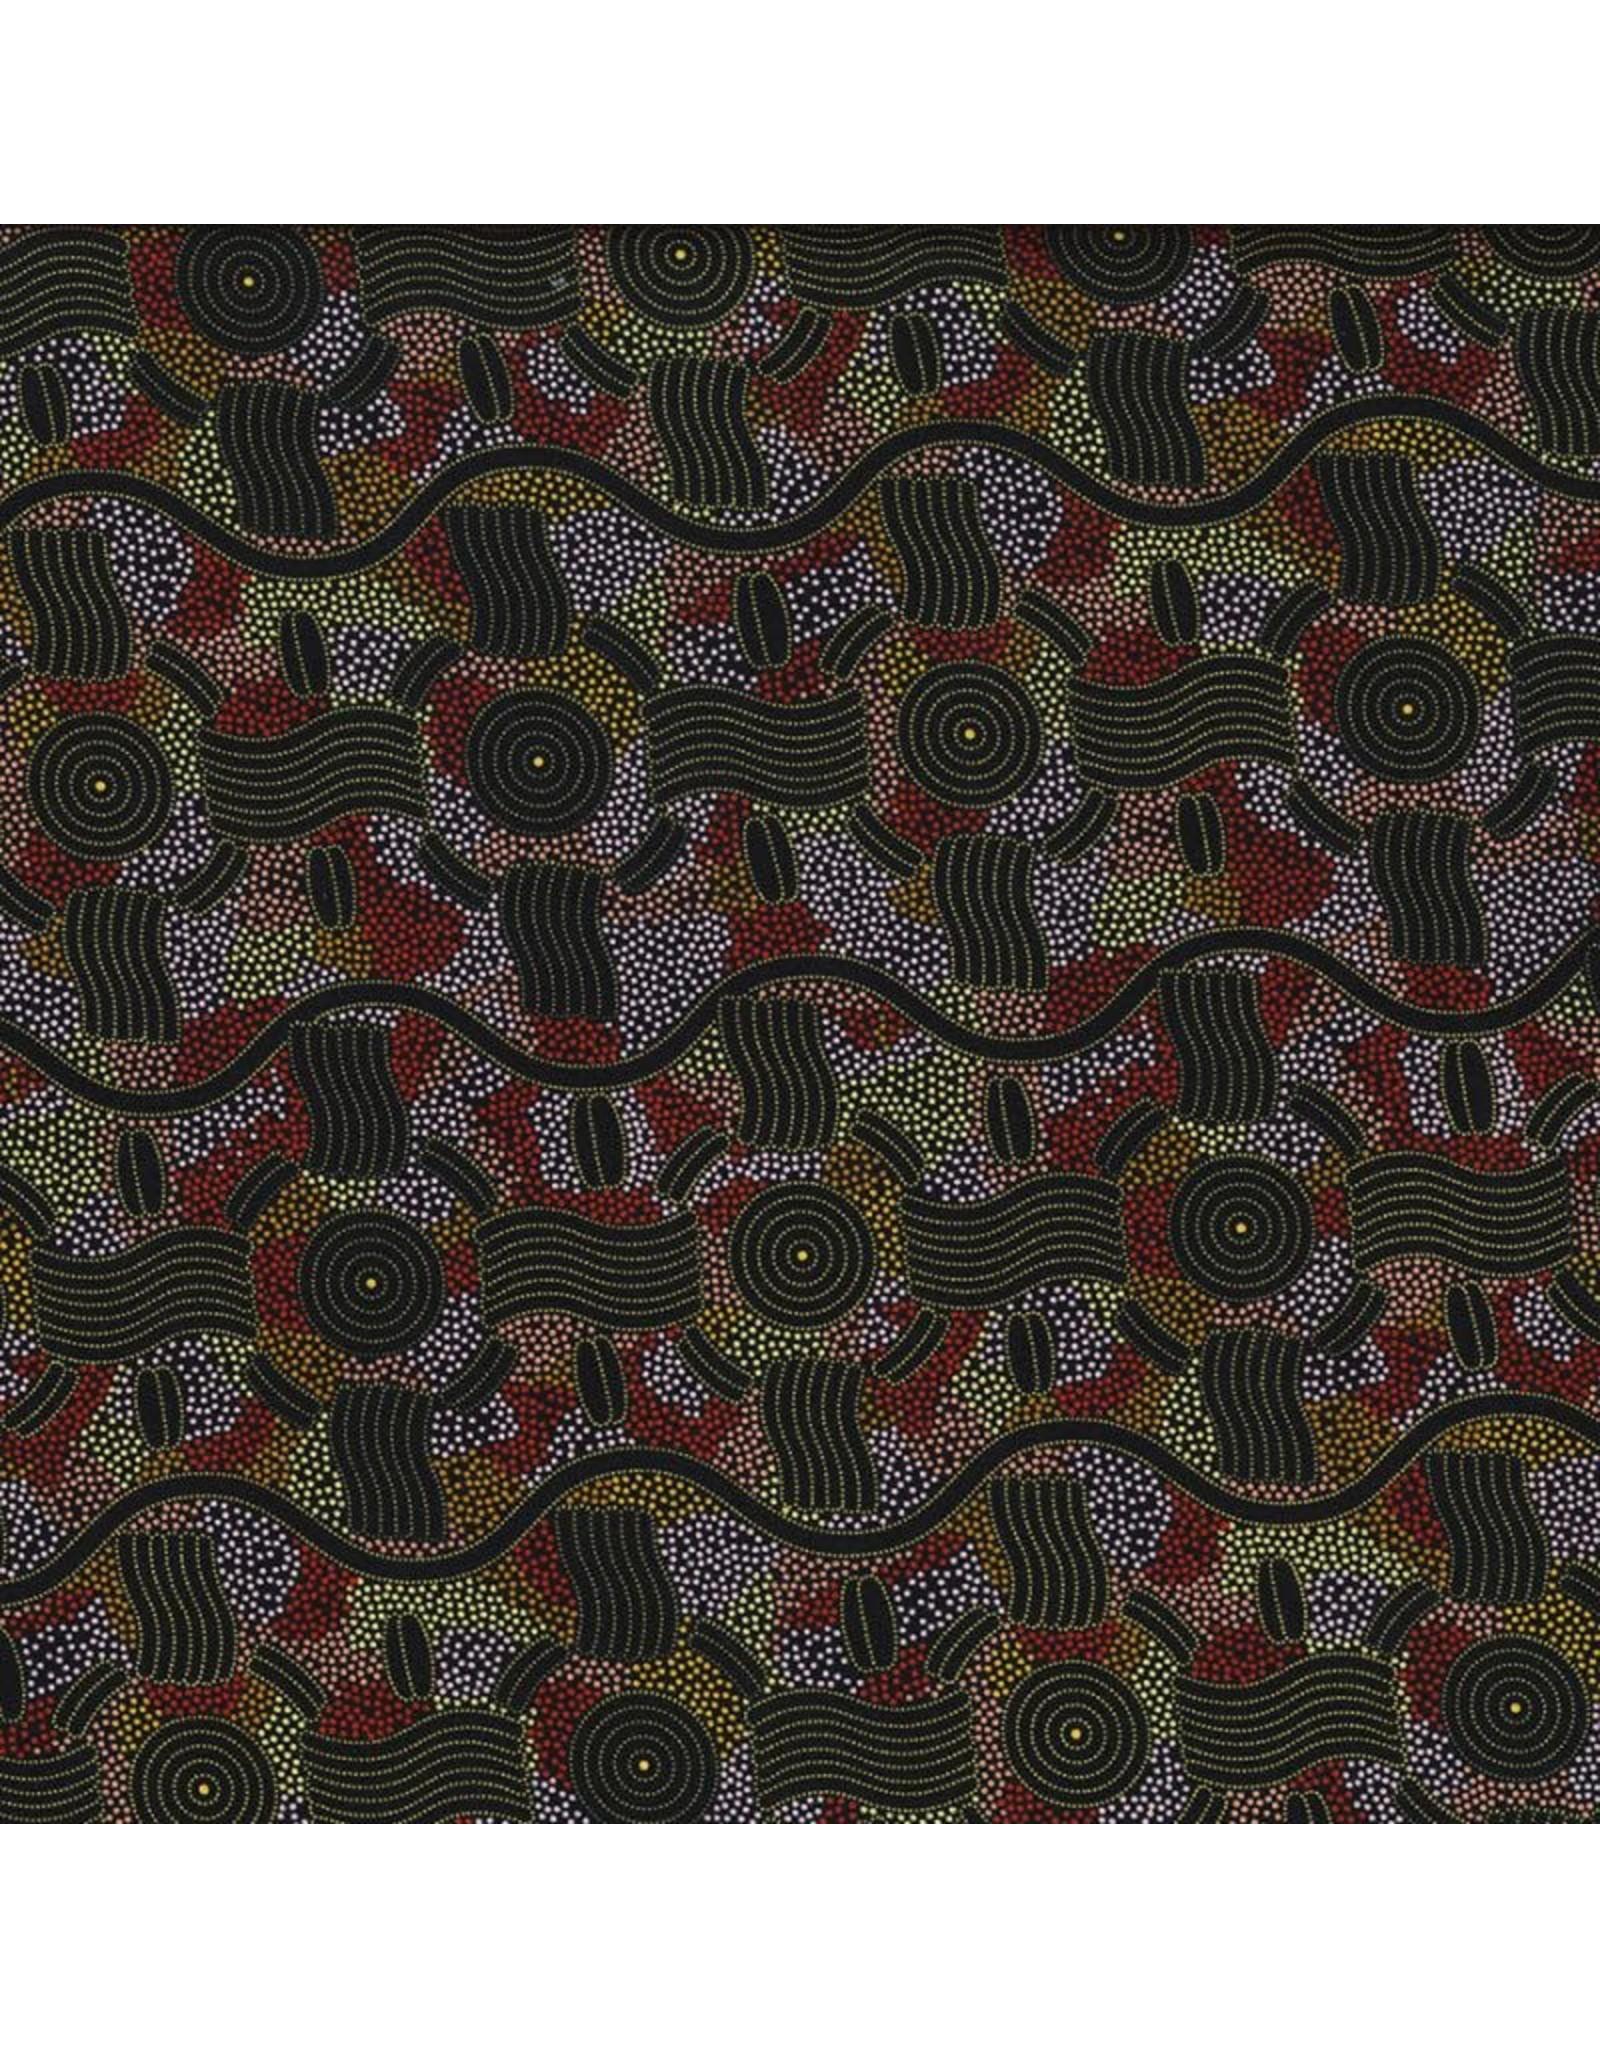 M&S Textiles Australia Aboriginal, Rain Dreaming in Gold, Fabric Half-Yards RAIDGO